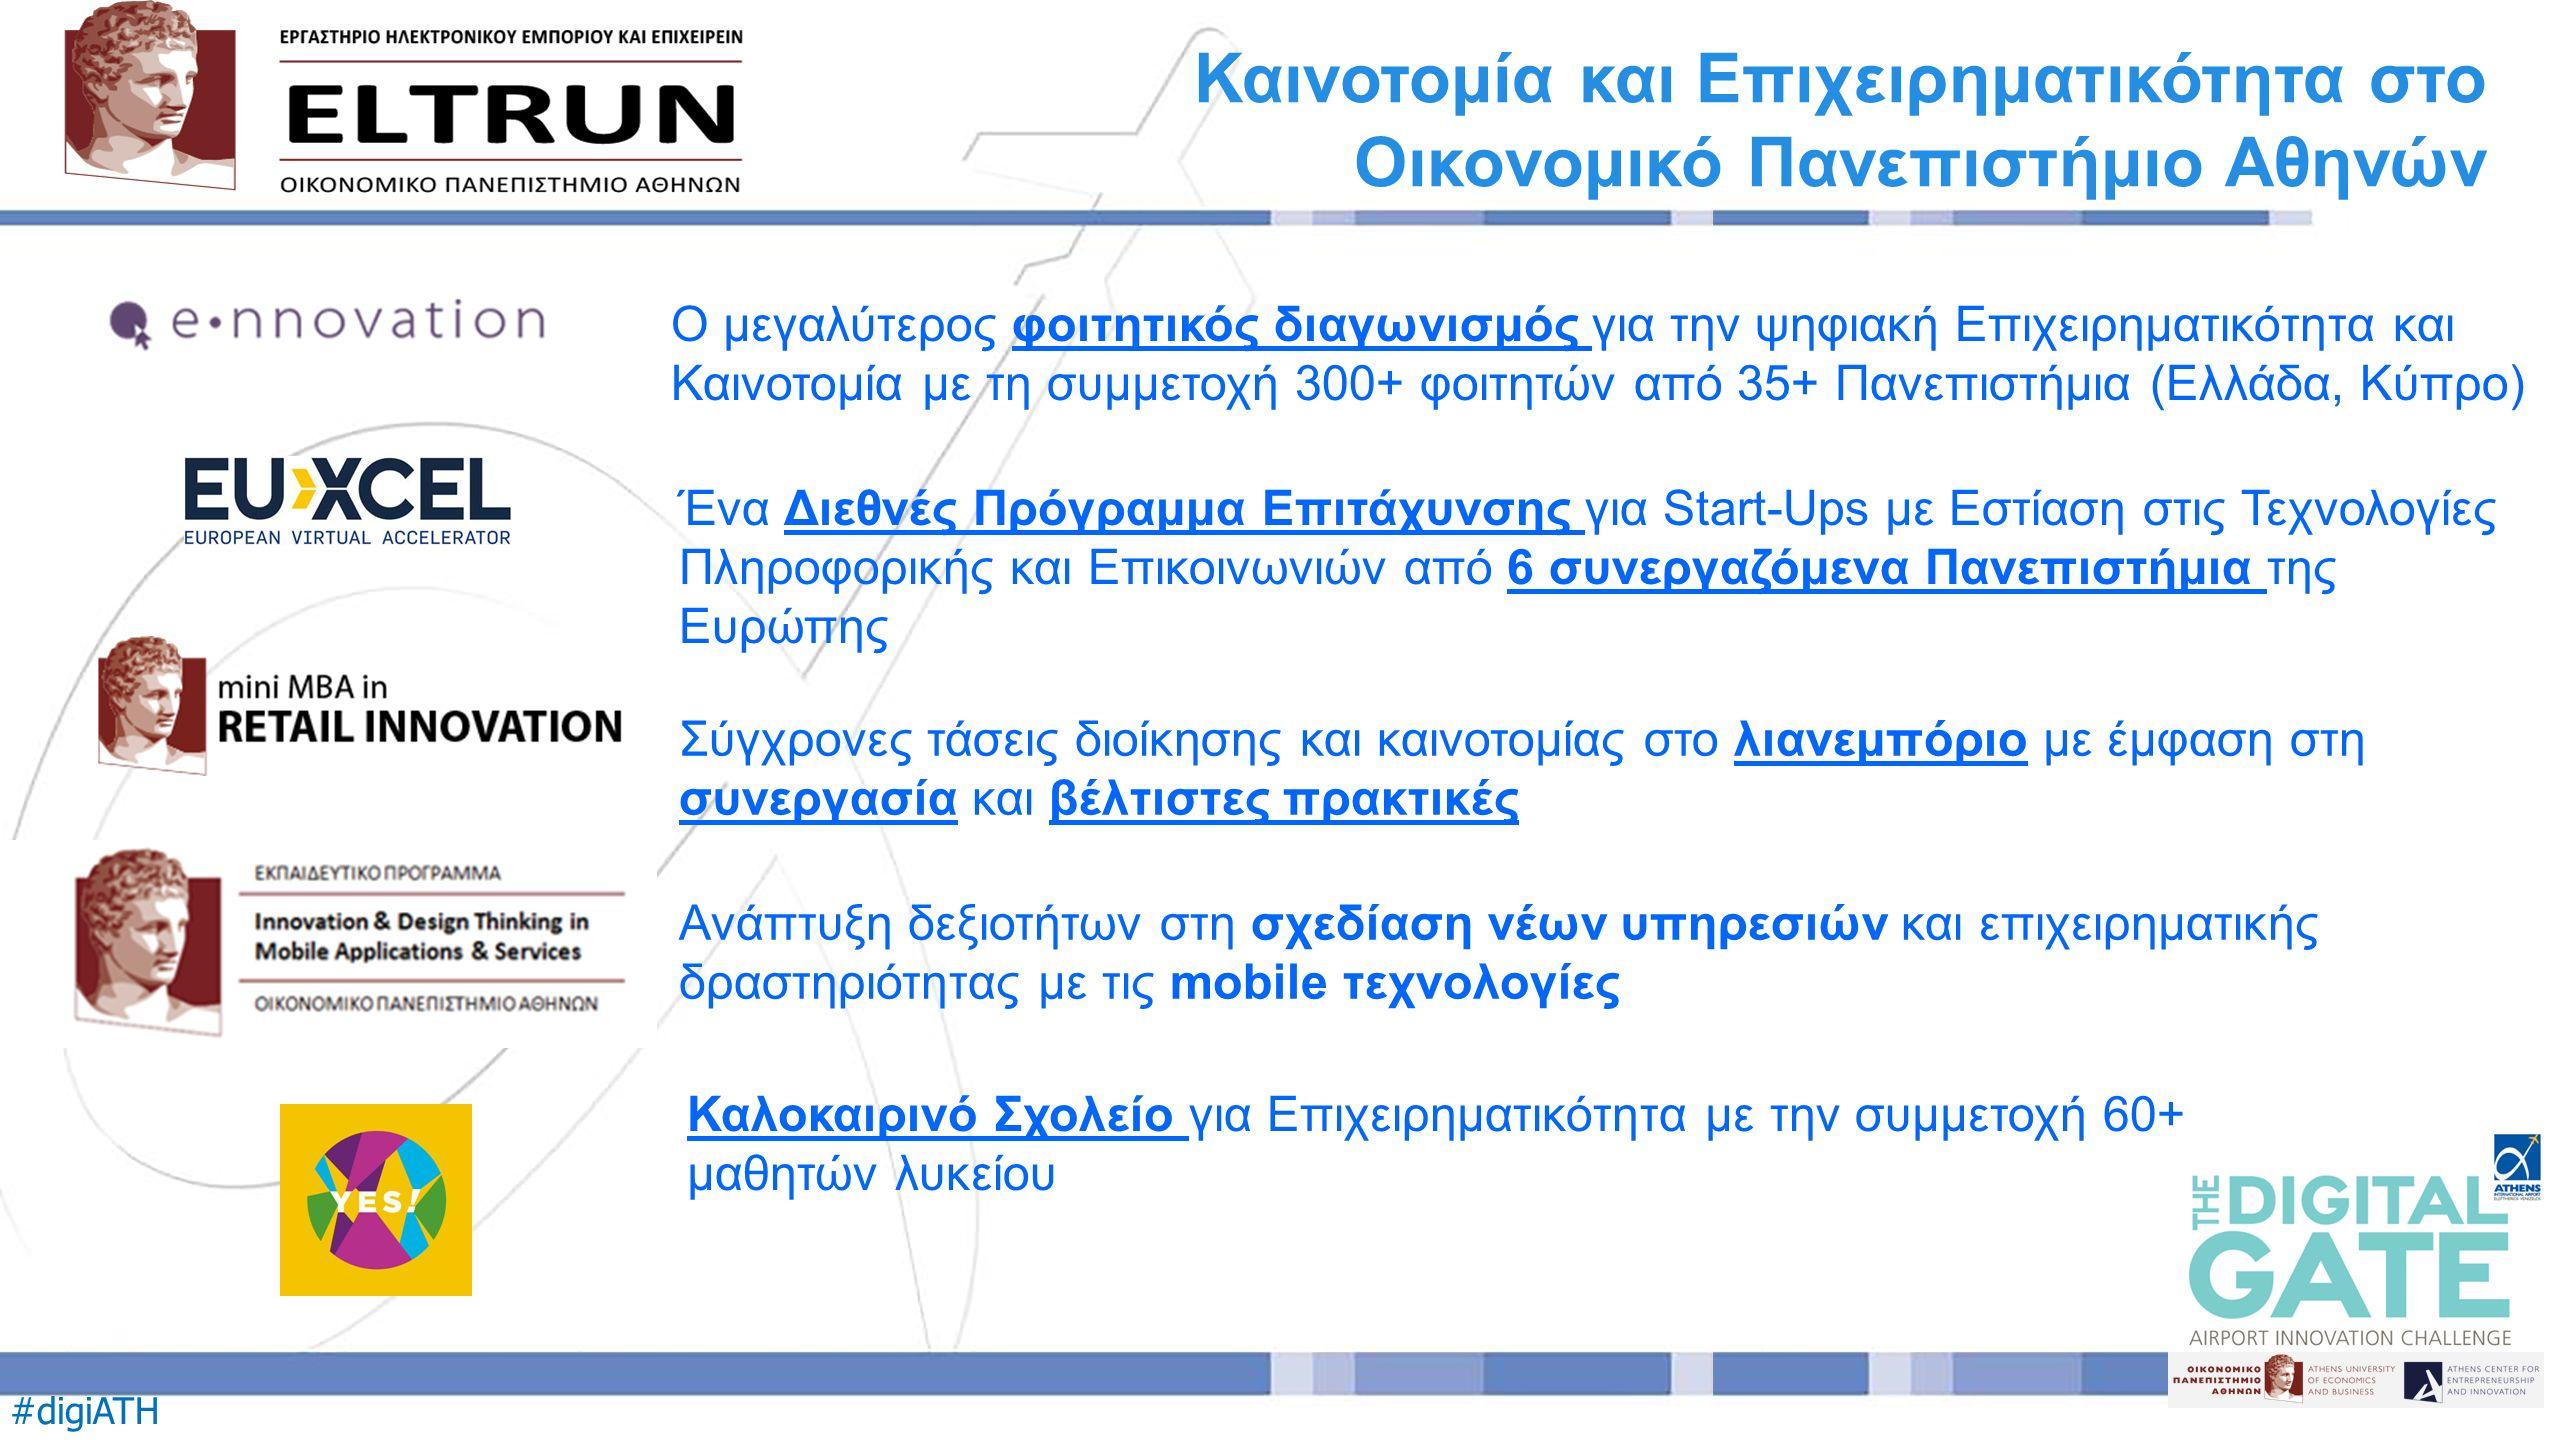 #digiATH O μεγαλύτερος φοιτητικός διαγωνισμός για την ψηφιακή Επιχειρηματικότητα και Καινοτομία με τη συμμετοχή 300+ φοιτητών από 35+ Πανεπιστήμια (Ελλάδα, Κύπρο) Καινοτομία και Επιχειρηματικότητα στο Οικονομικό Πανεπιστήμιο Αθηνών Ένα Διεθνές Πρόγραμμα Επιτάχυνσης για Start-Ups με Εστίαση στις Τεχνολογίες Πληροφορικής και Επικοινωνιών από 6 συνεργαζόμενα Πανεπιστήμια της Ευρώπης Ανάπτυξη δεξιοτήτων στη σχεδίαση νέων υπηρεσιών και επιχειρηματικής δραστηριότητας με τις mobile τεχνολογίες Σύγχρονες τάσεις διοίκησης και καινοτομίας στο λιανεμπόριο με έμφαση στη συνεργασία και βέλτιστες πρακτικές Καλοκαιρινό Σχολείο για Επιχειρηματικότητα με την συμμετοχή 60+ μαθητών λυκείου